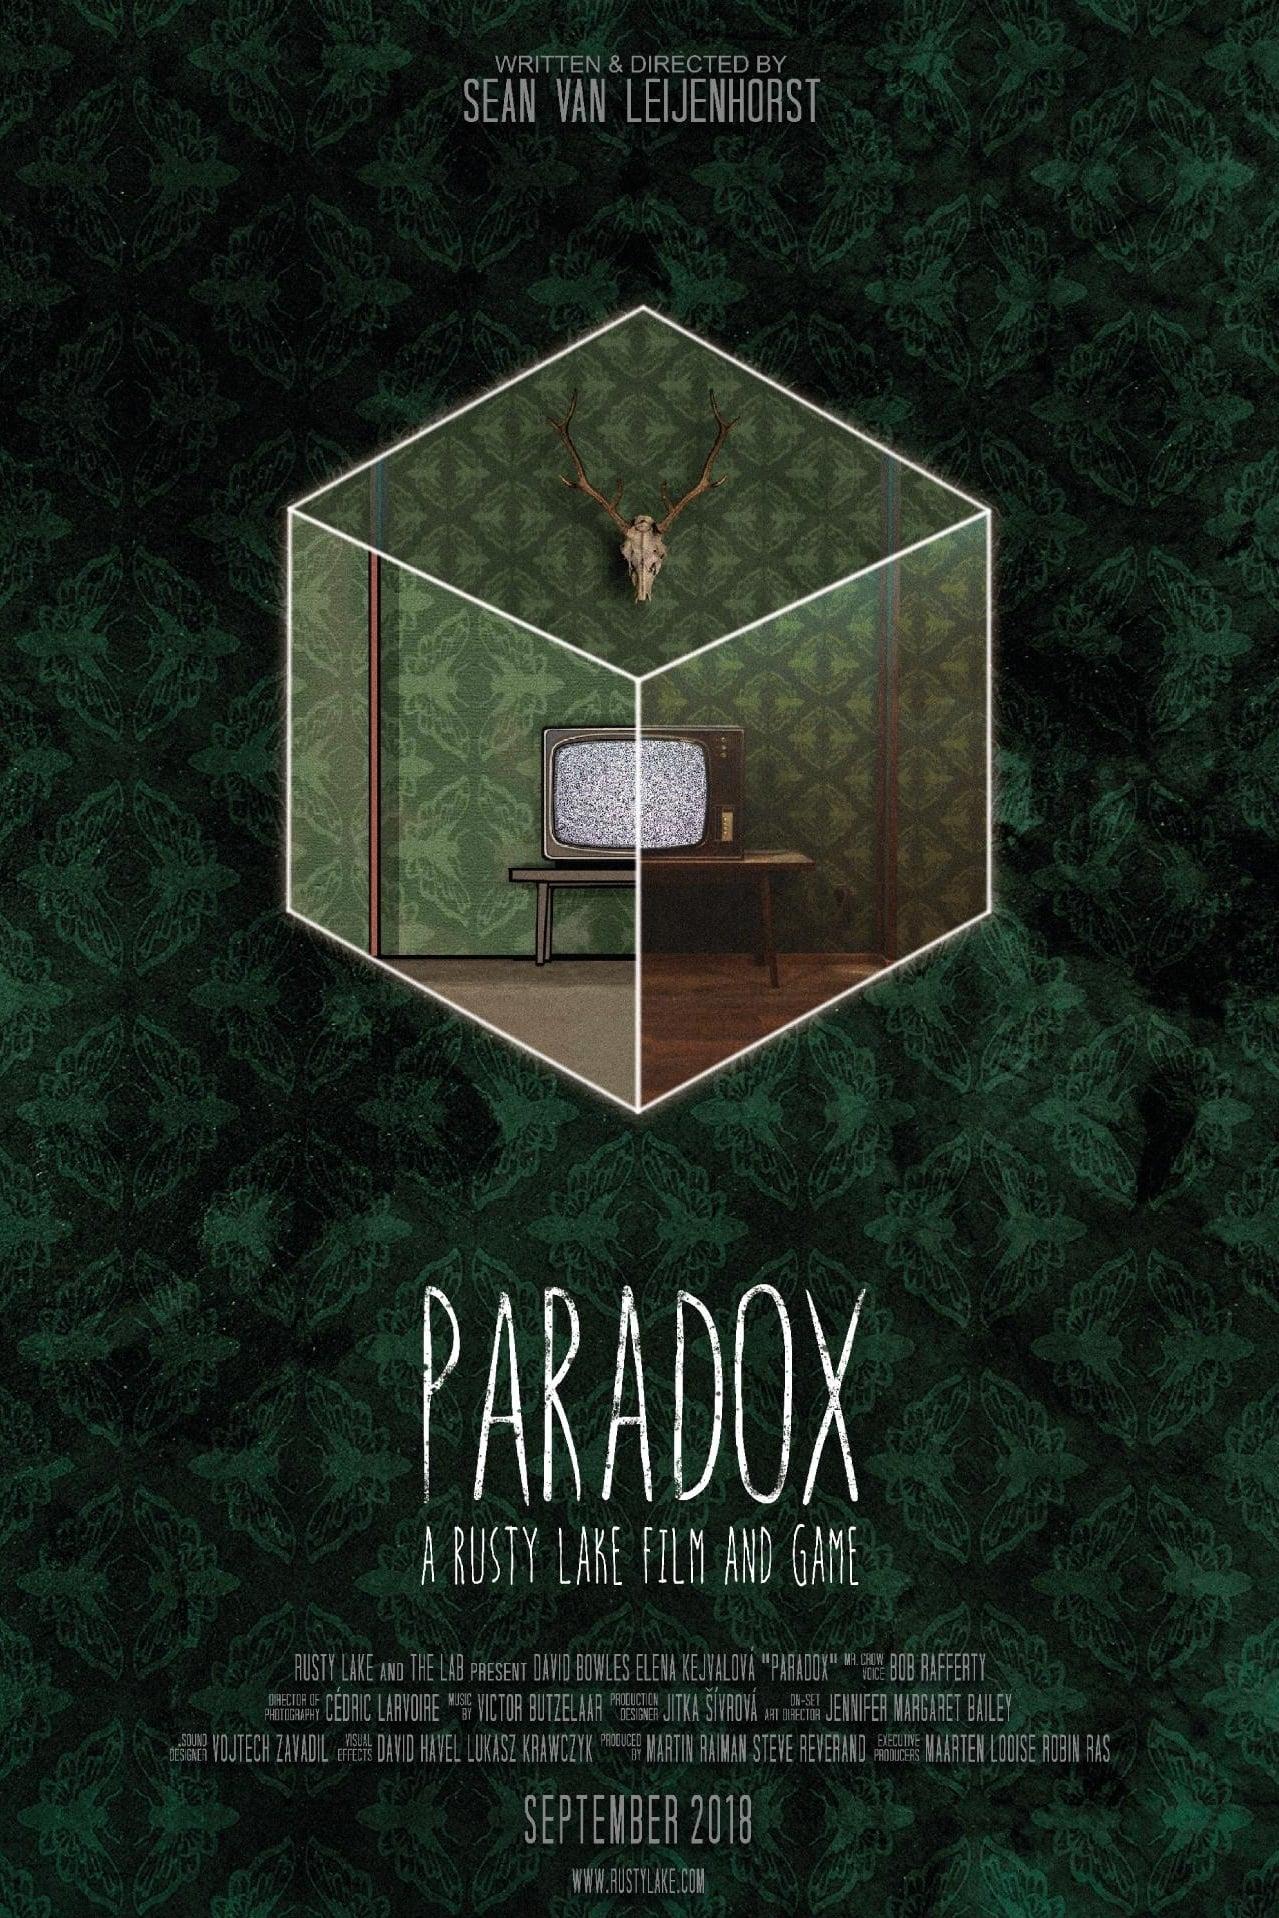 Paradox: A Rusty Lake Film